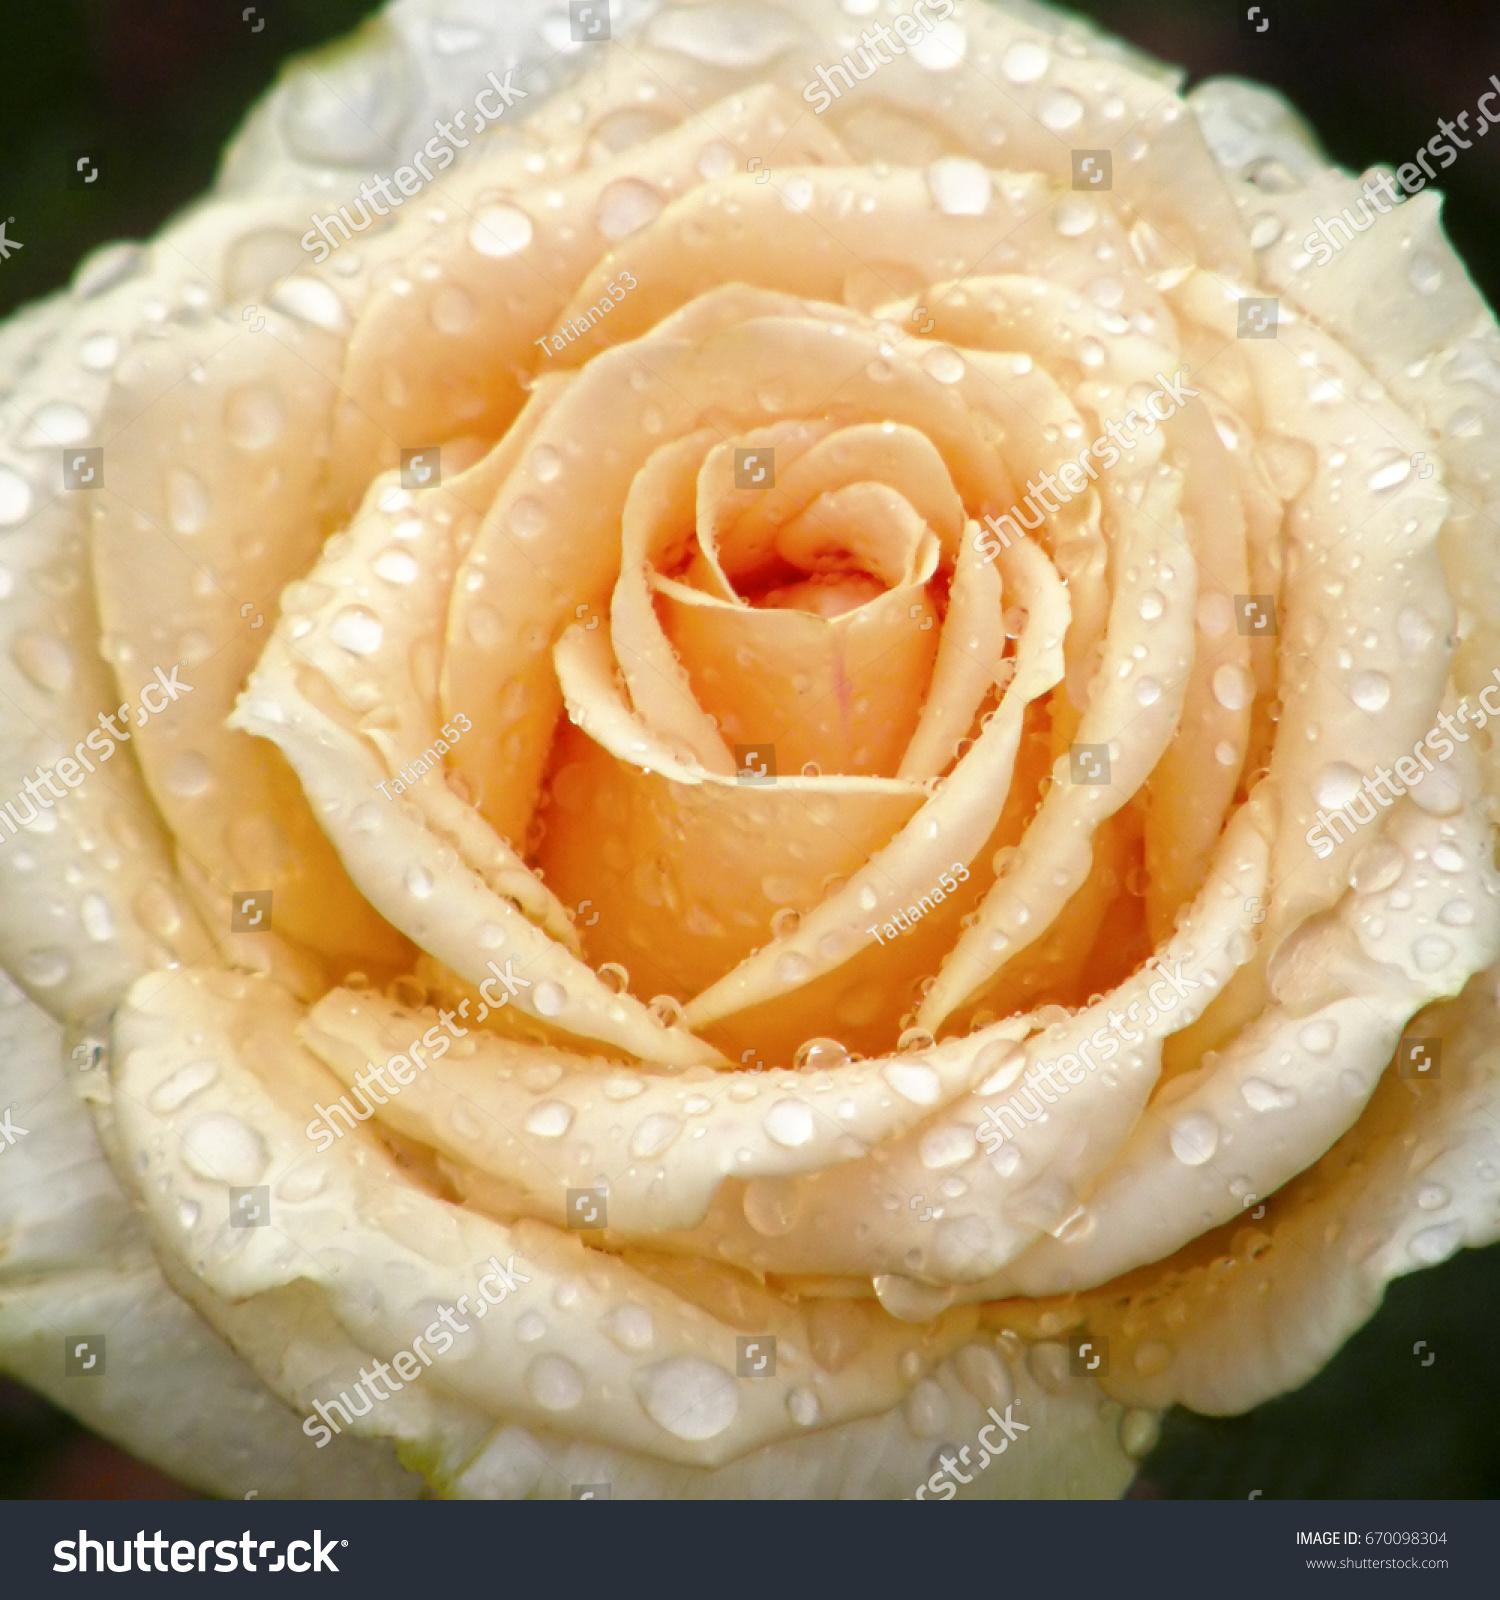 Rose flower flowers very beautiful image stock photo royalty free rose flower flowers very beautiful image izmirmasajfo